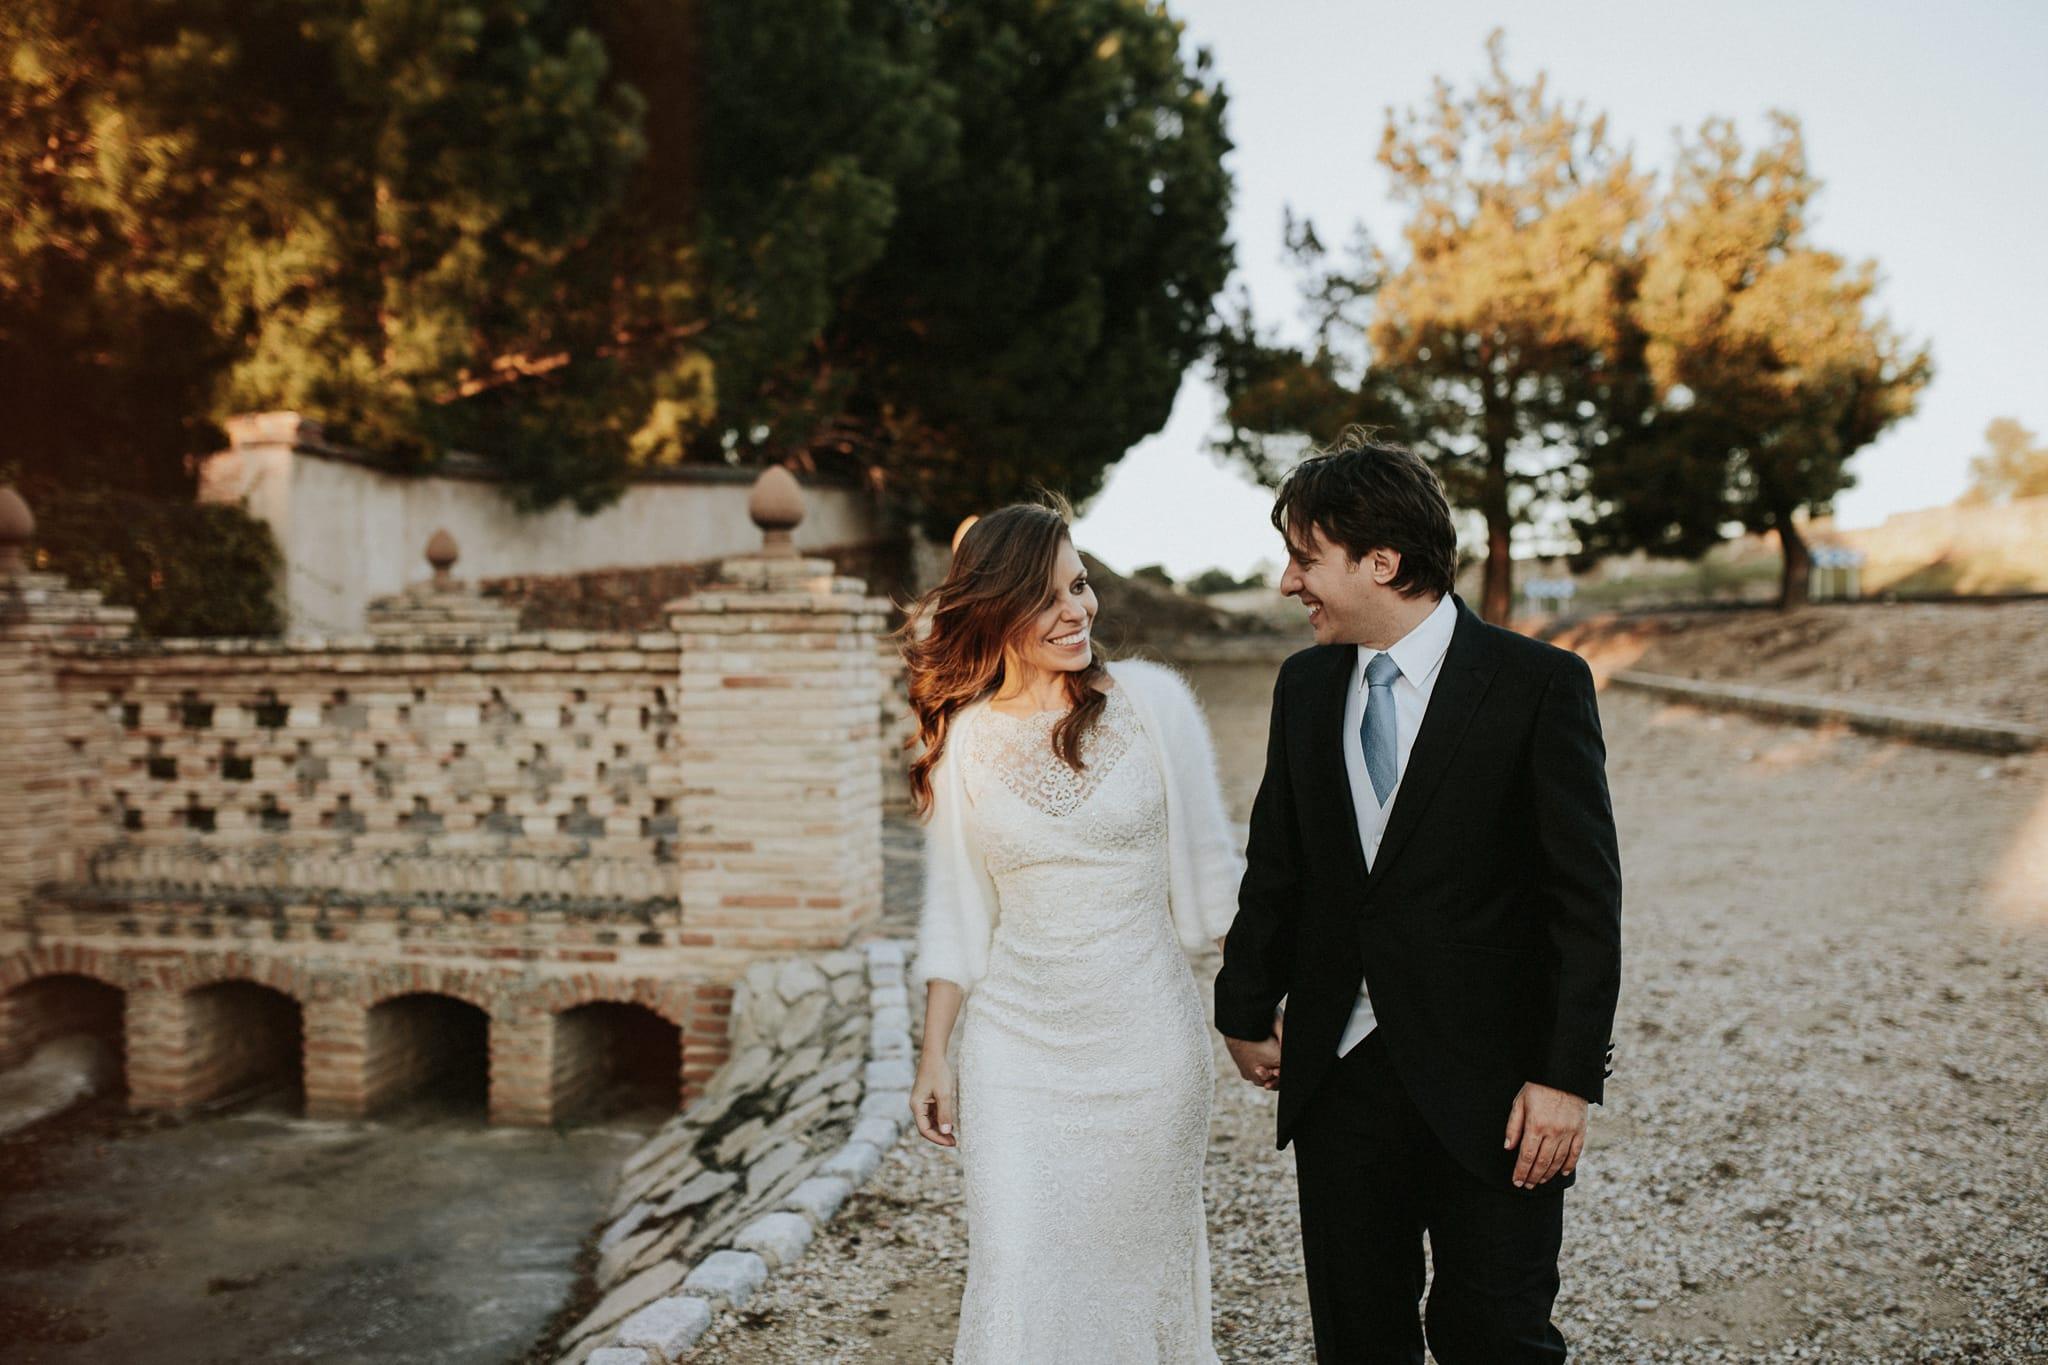 Fotografo-bodas-Cigarral-de-las-Mercedes-109